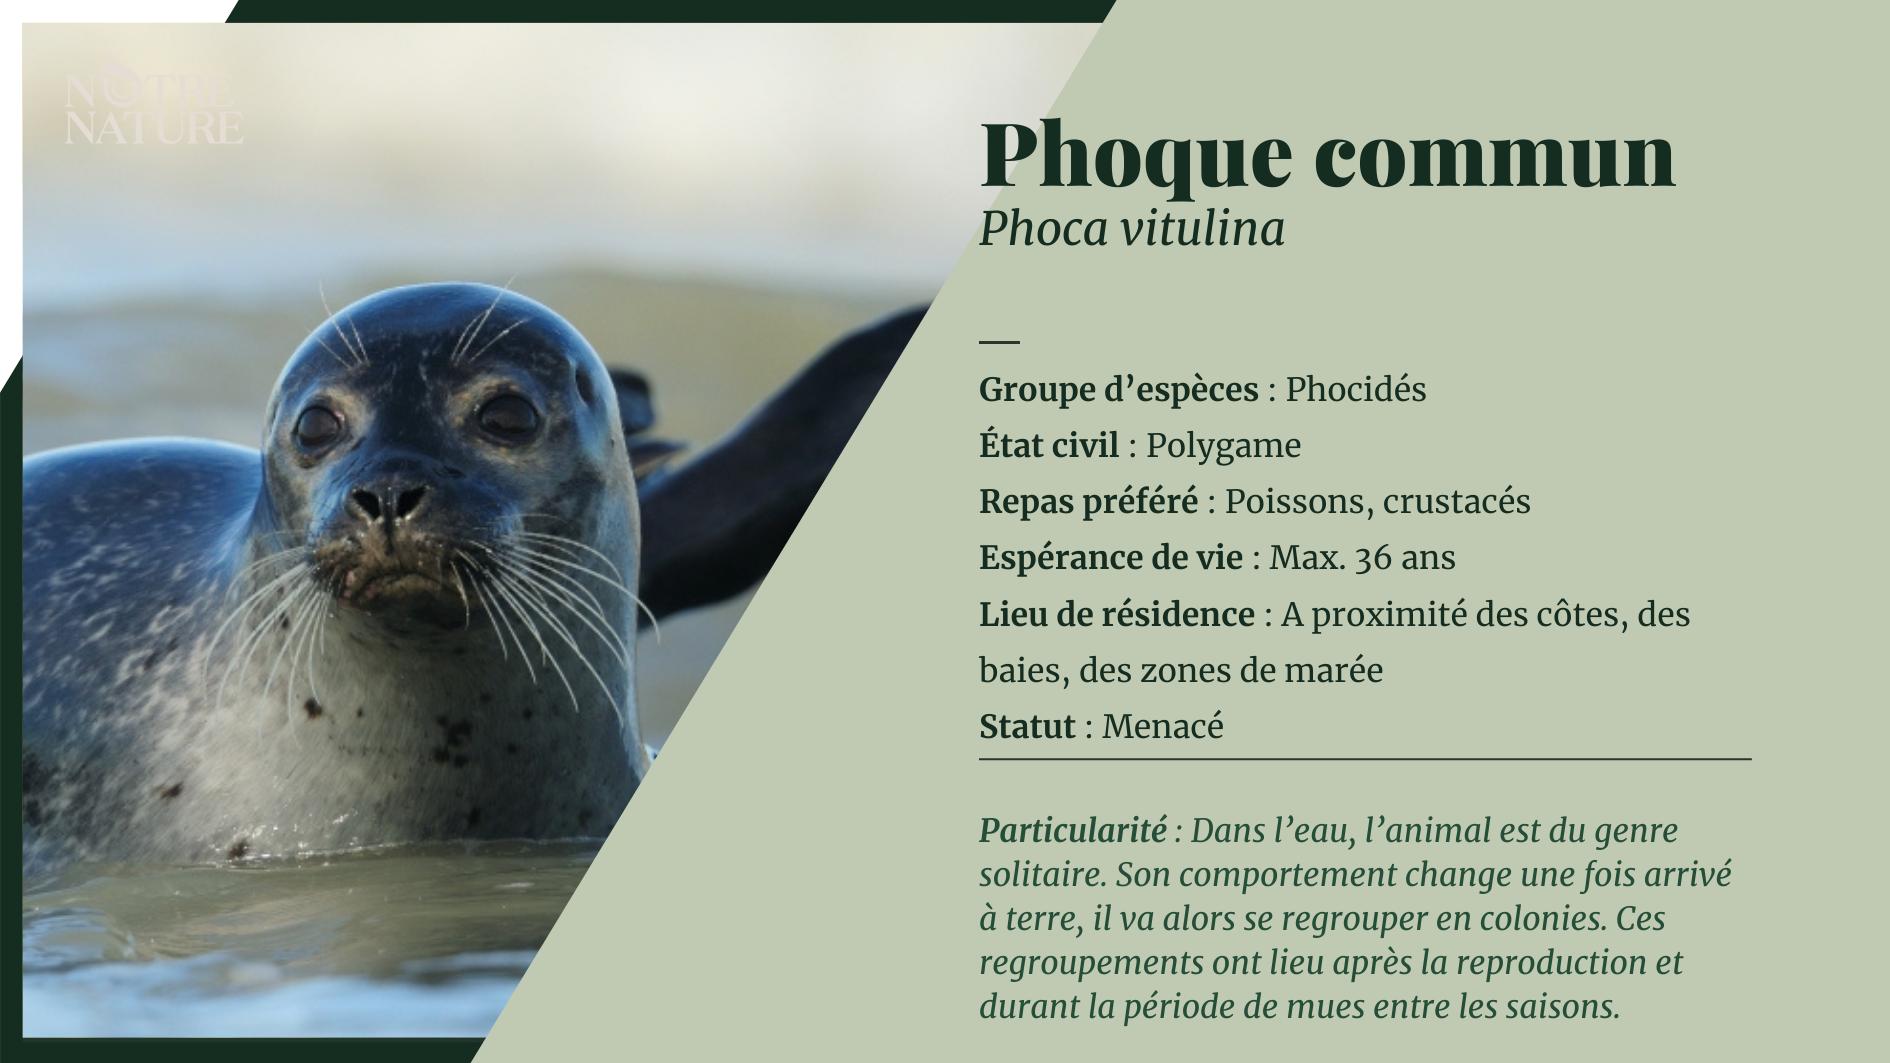 on-fiche-phoque-commun.png